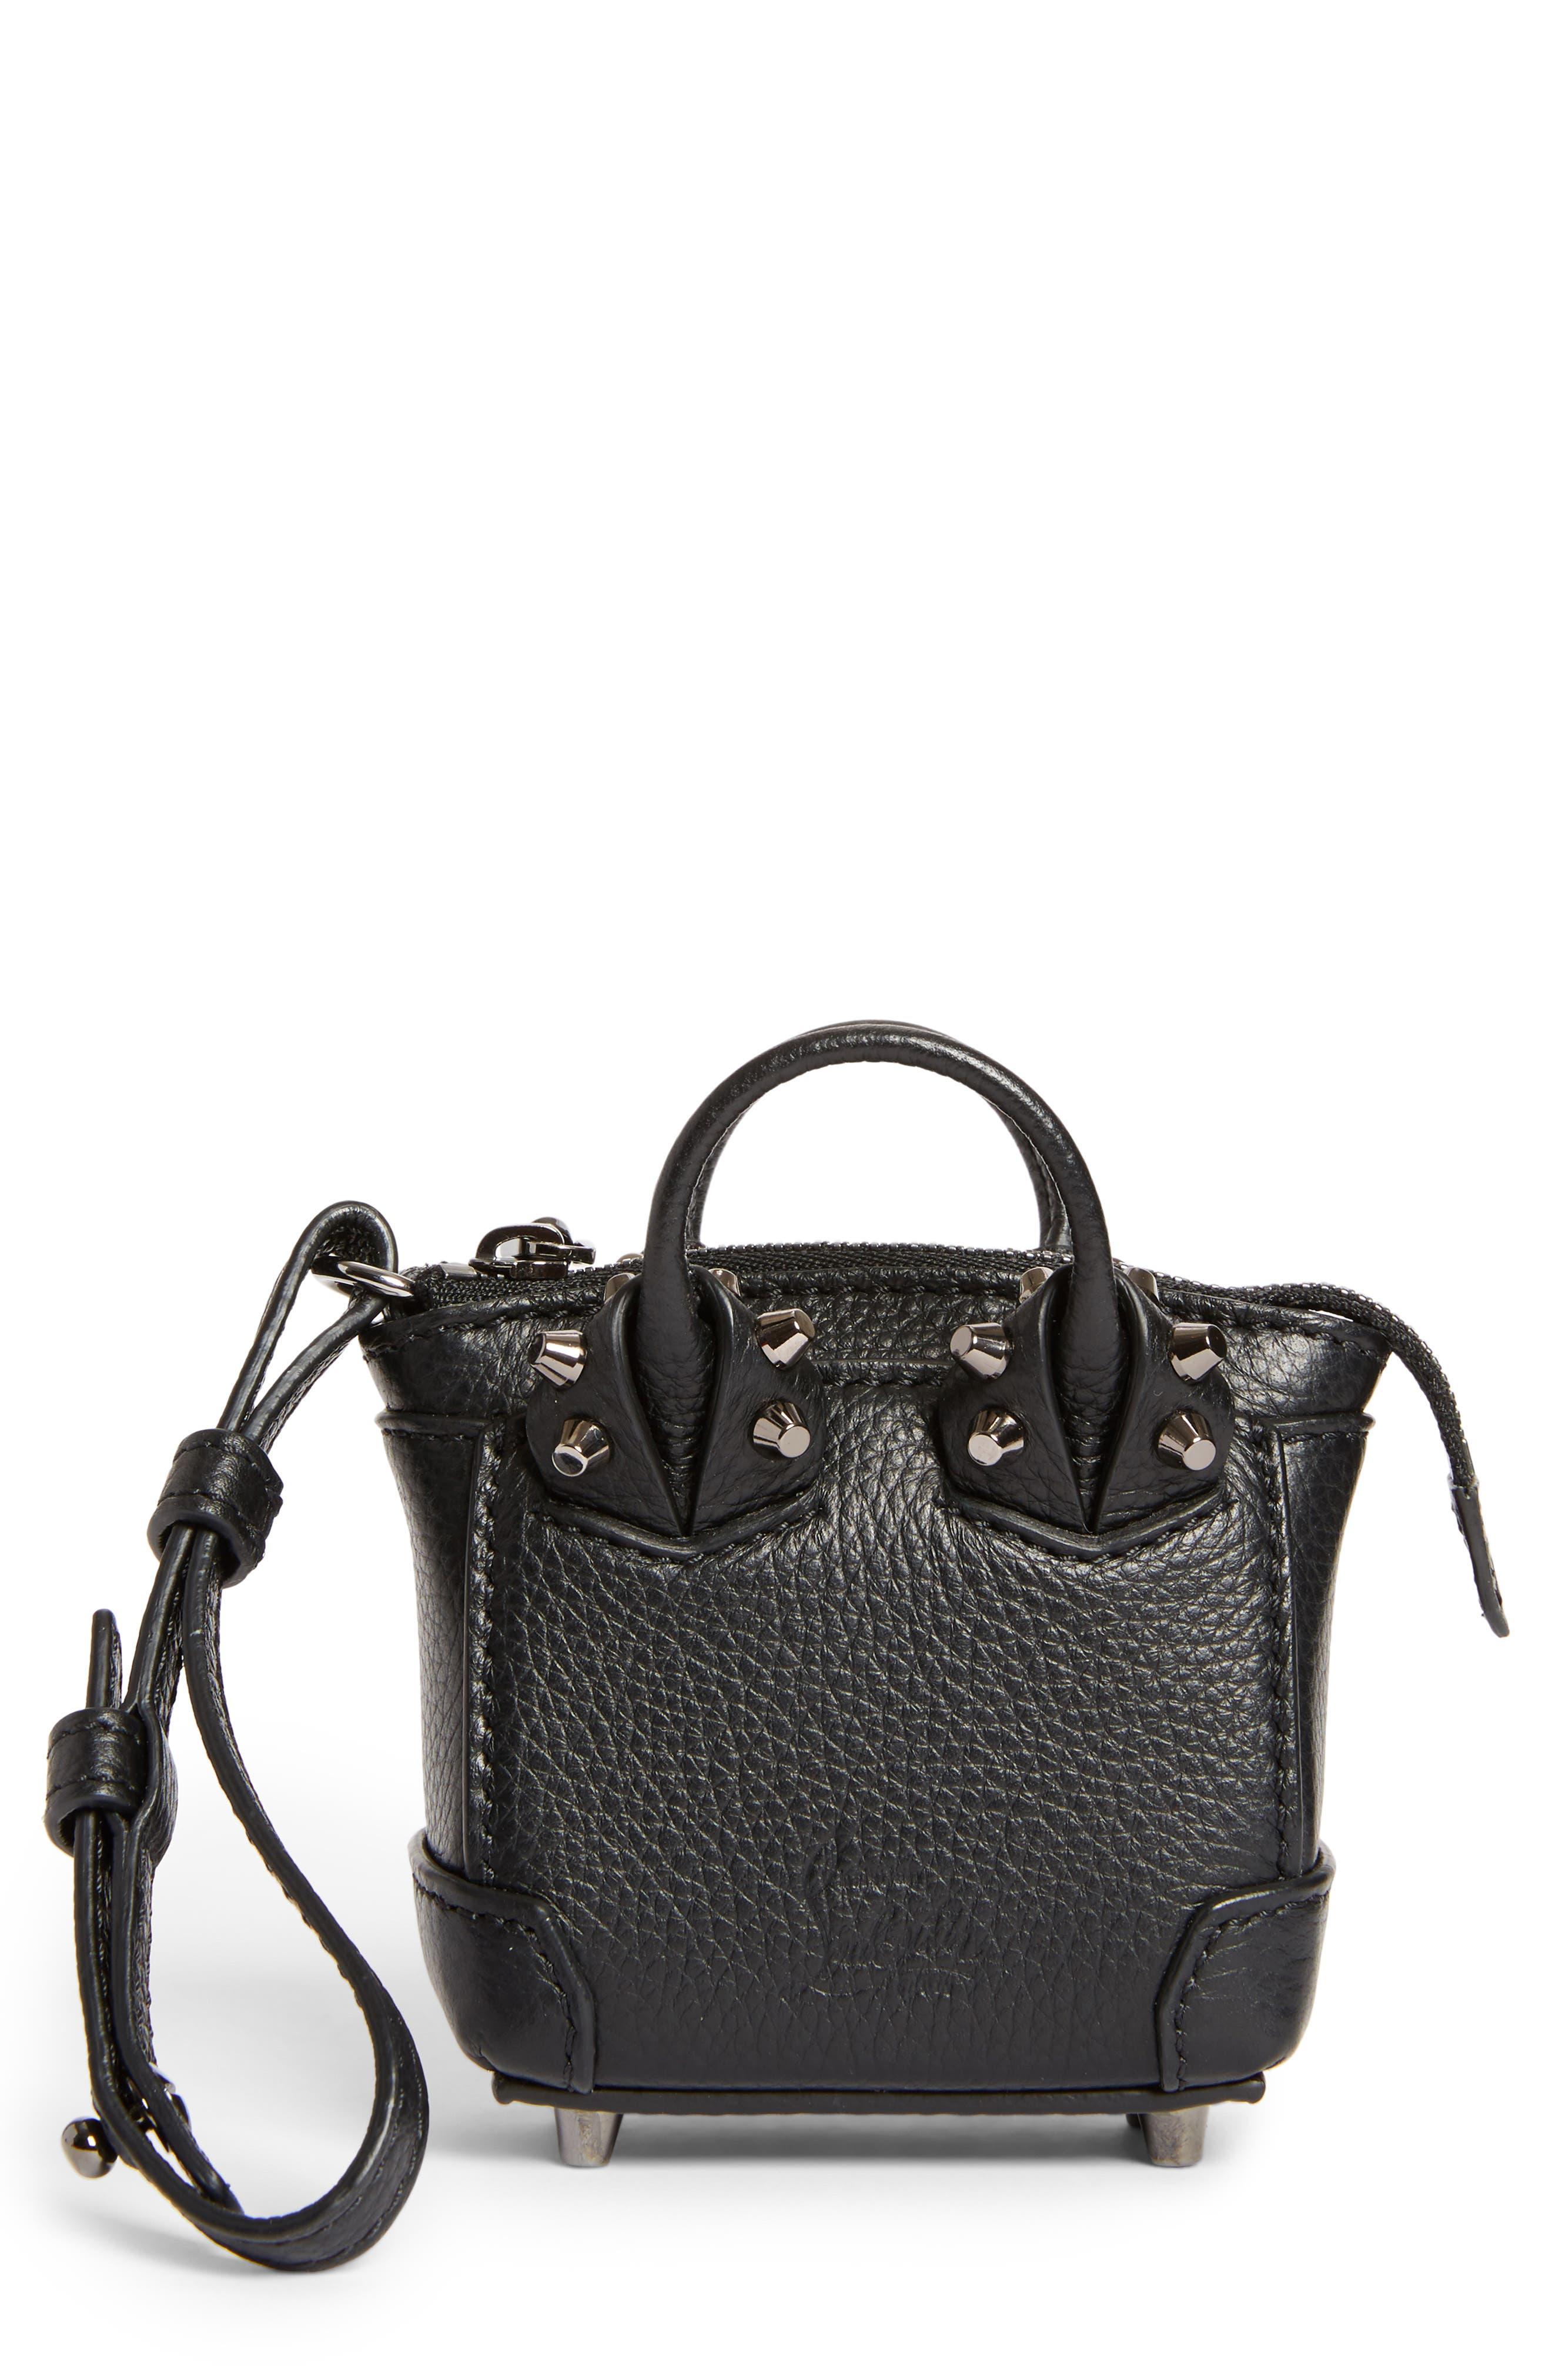 Eloise Mini Leather Bag Charm,                             Main thumbnail 1, color,                             BLACK/ GUN METAL